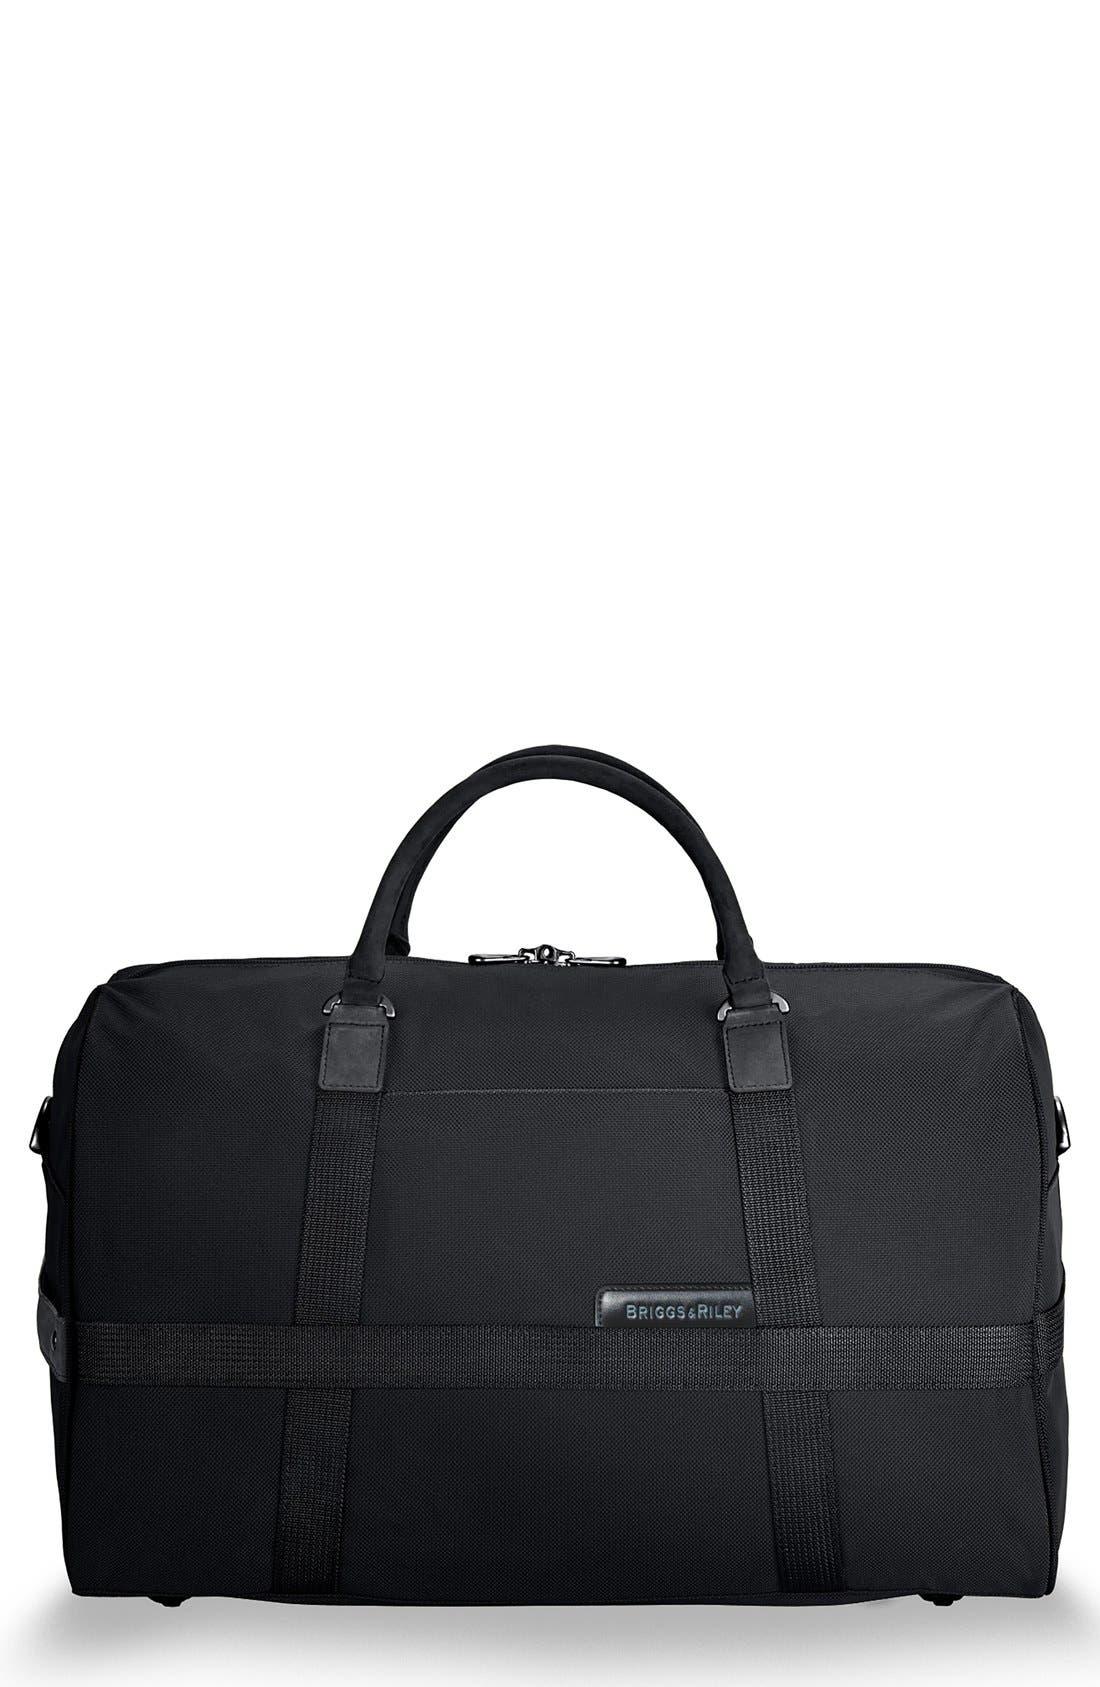 'Baseline - Medium' Duffel Bag,                             Main thumbnail 2, color,